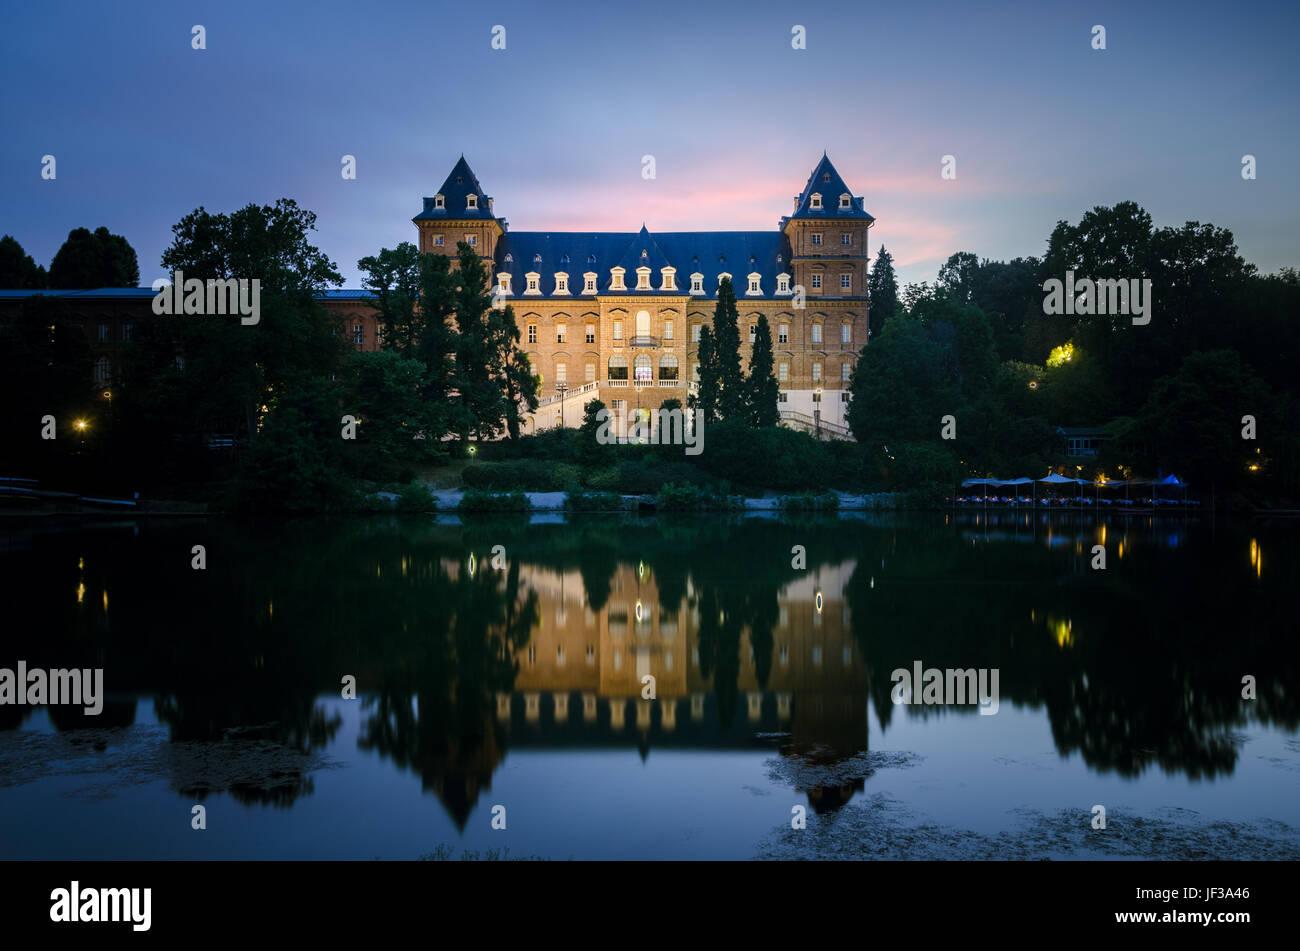 Turín castillo Valentino en penumbra Foto de stock